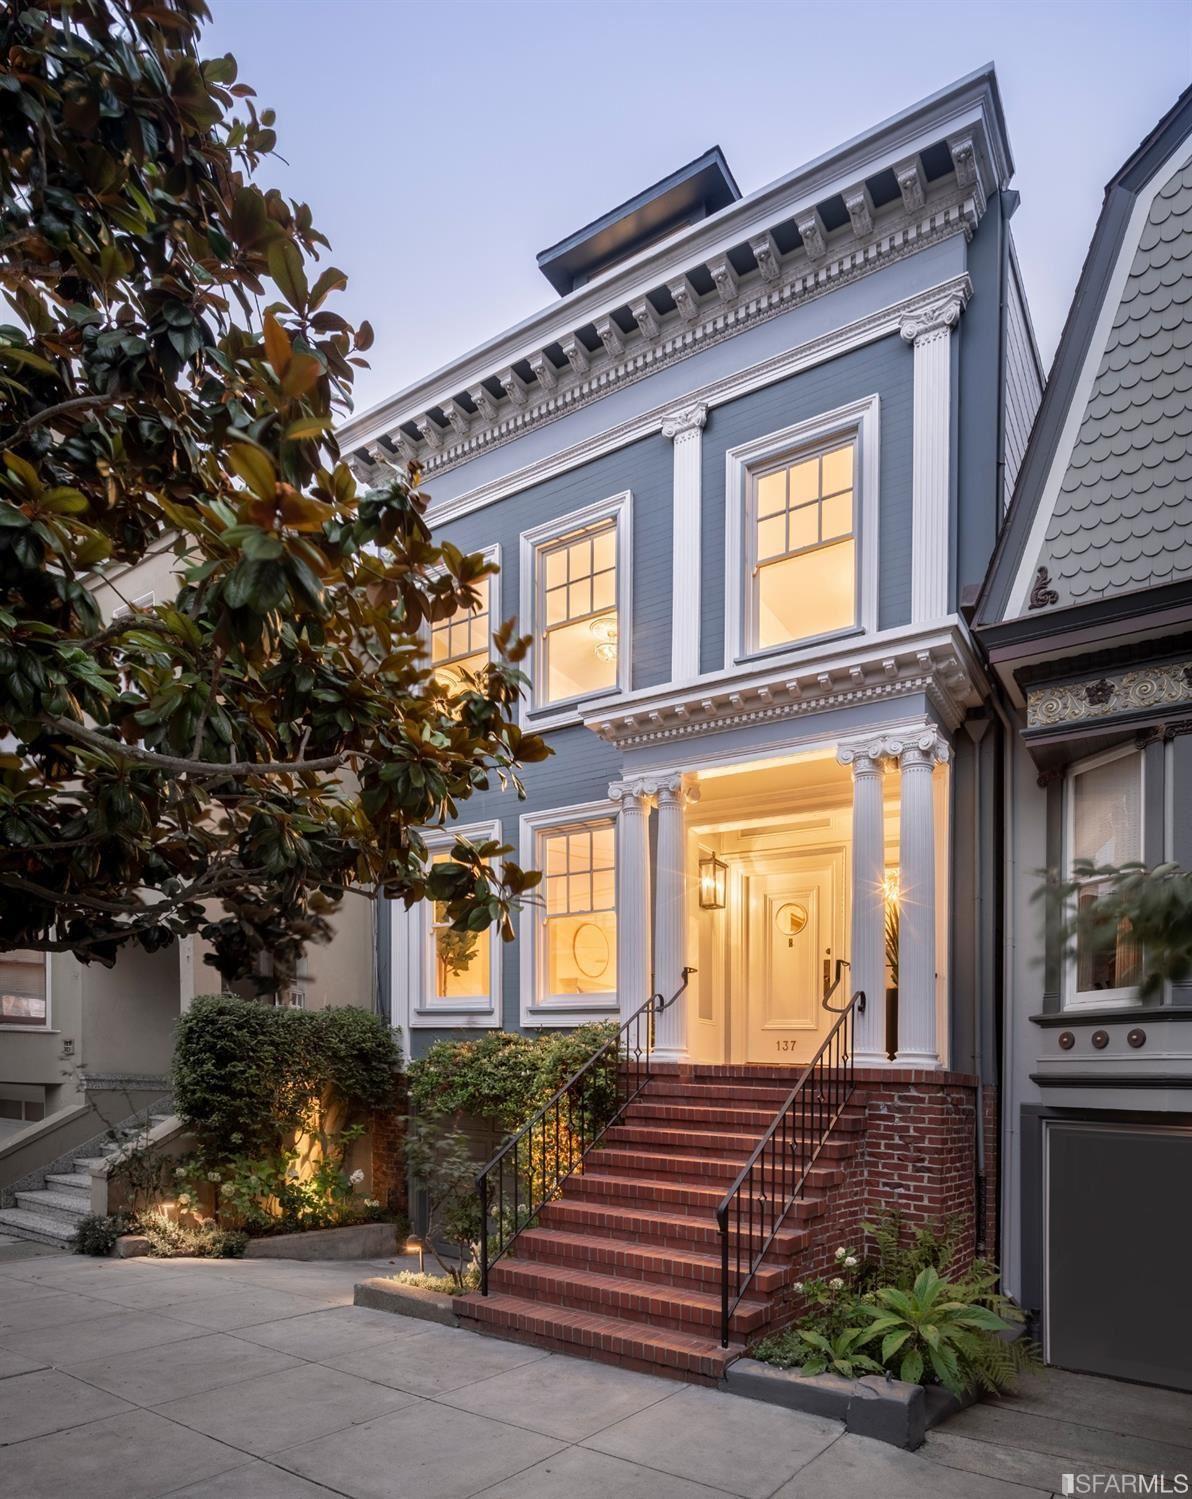 137 3rd Avenue, San Francisco, CA 94118 - #: 505490